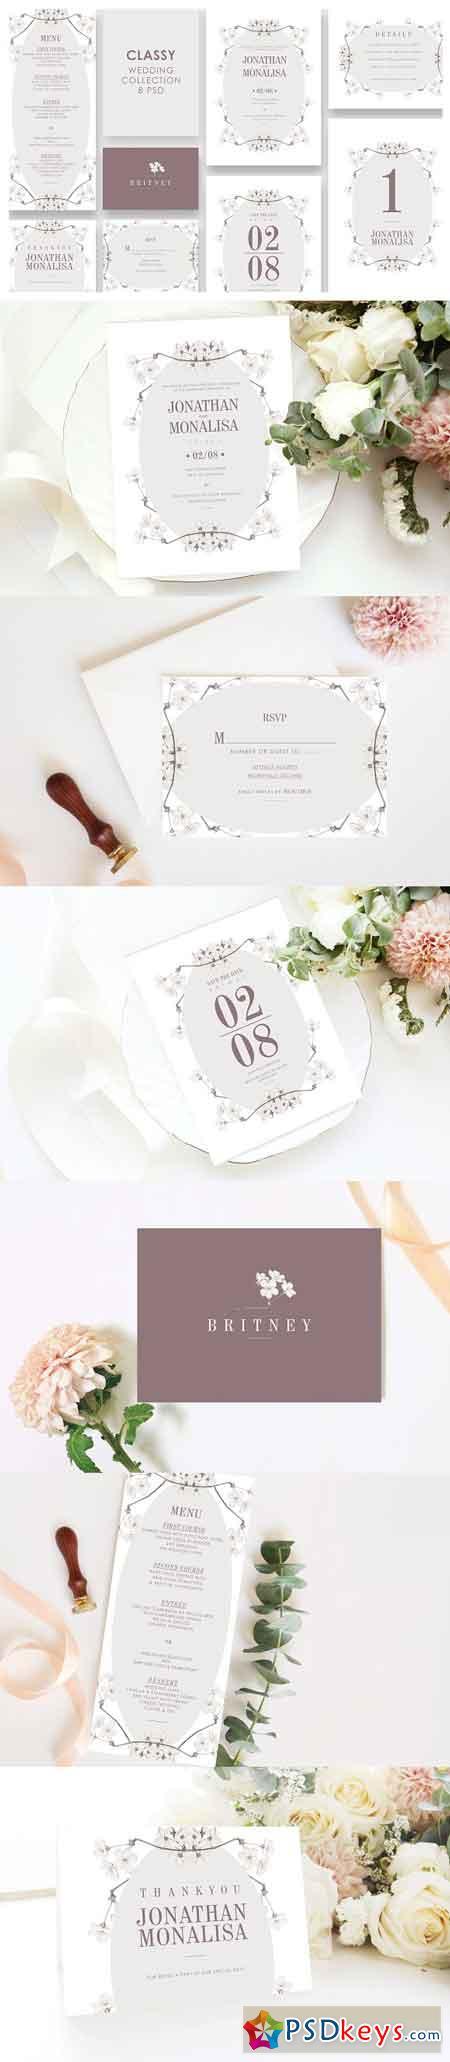 Classy Wedding Invitation Set 3305983